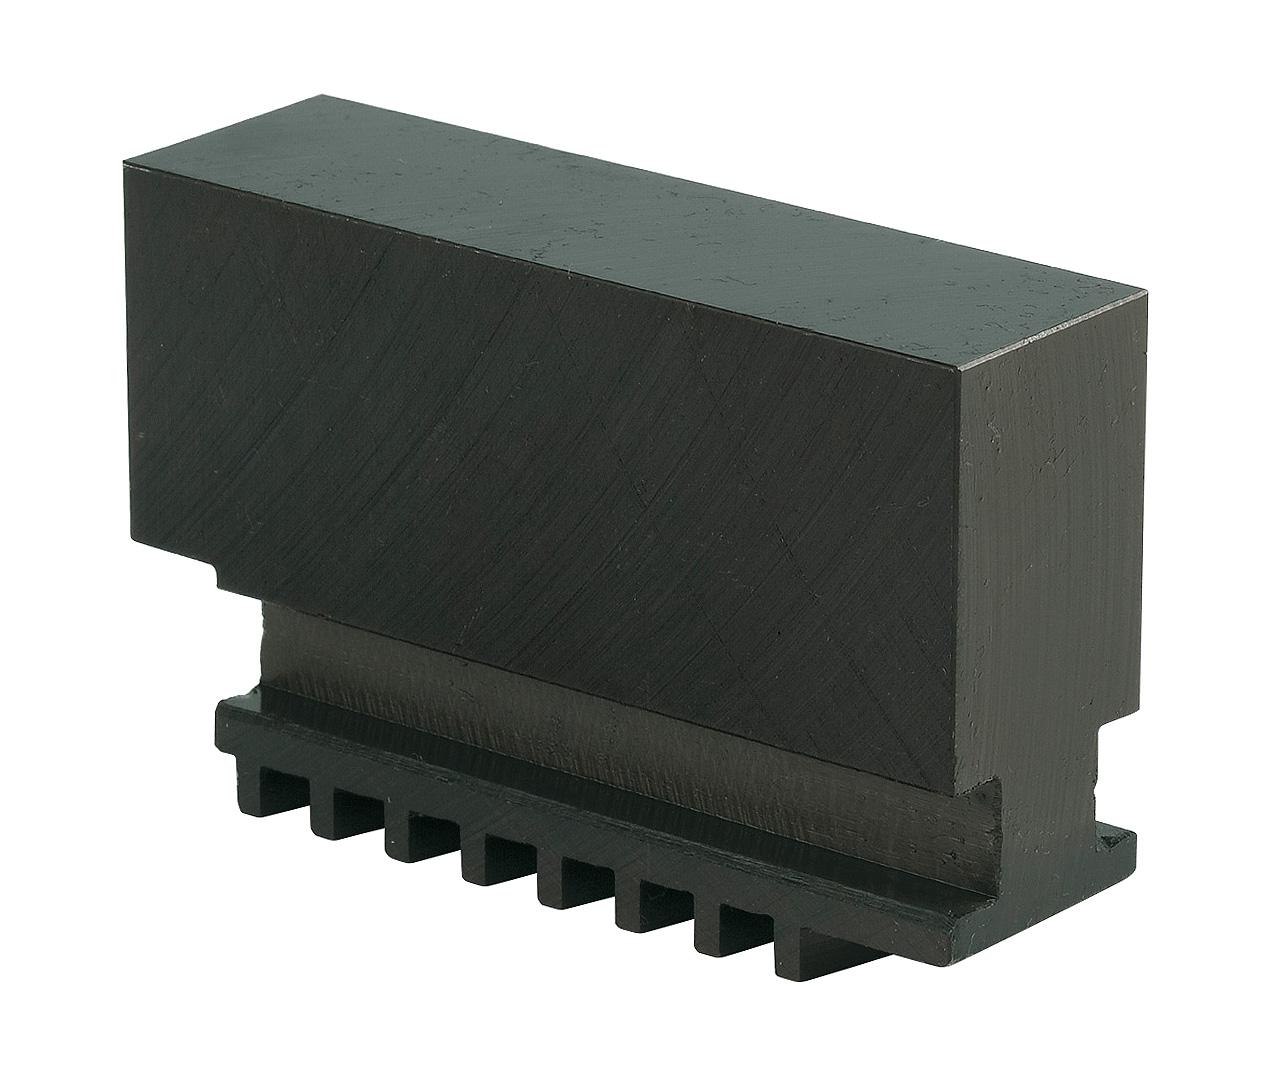 Szczęki jednolite miękkie - komplet SJ-PS4-500 BERNARDO